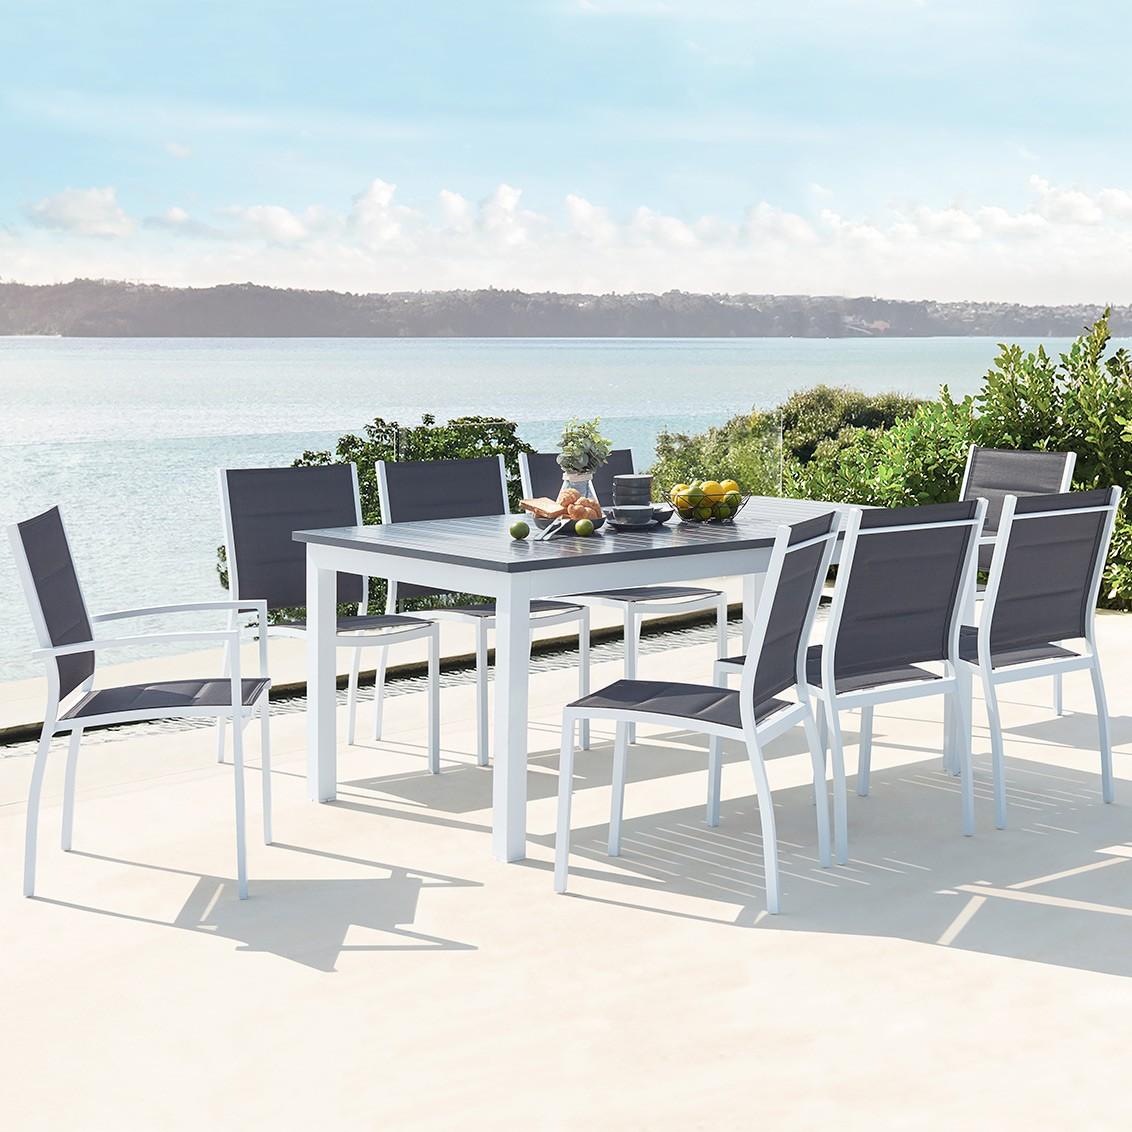 Mazzara 8 blanc : salon de jardin extensible en aluminium + 8 ...